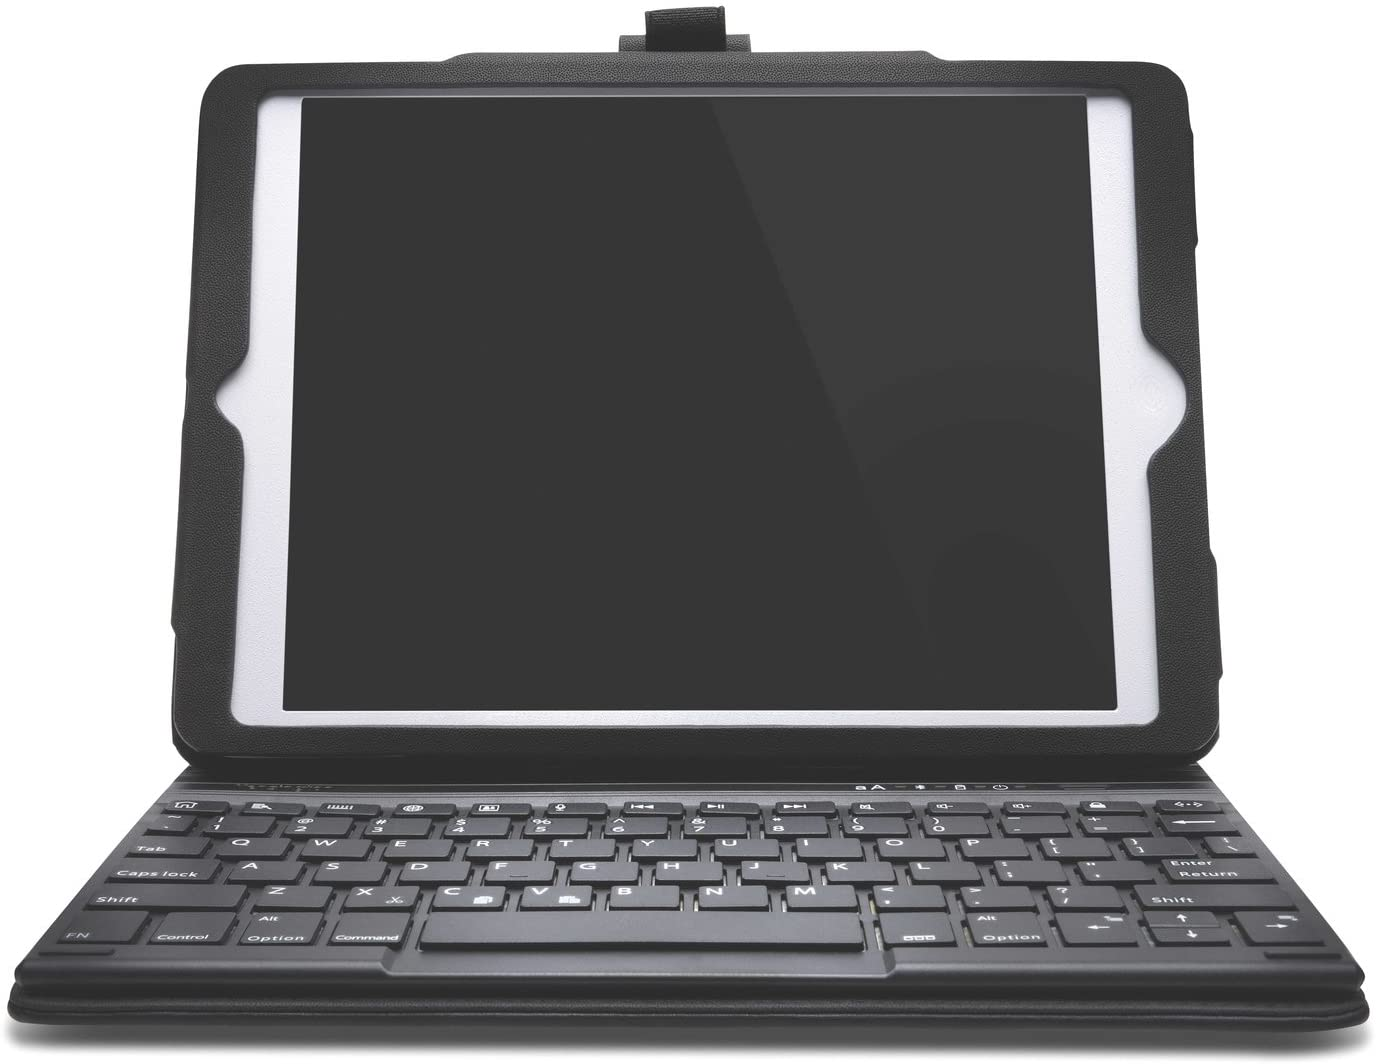 Kensington KeyFolio Pro Folio with Keyboard for iPad Air